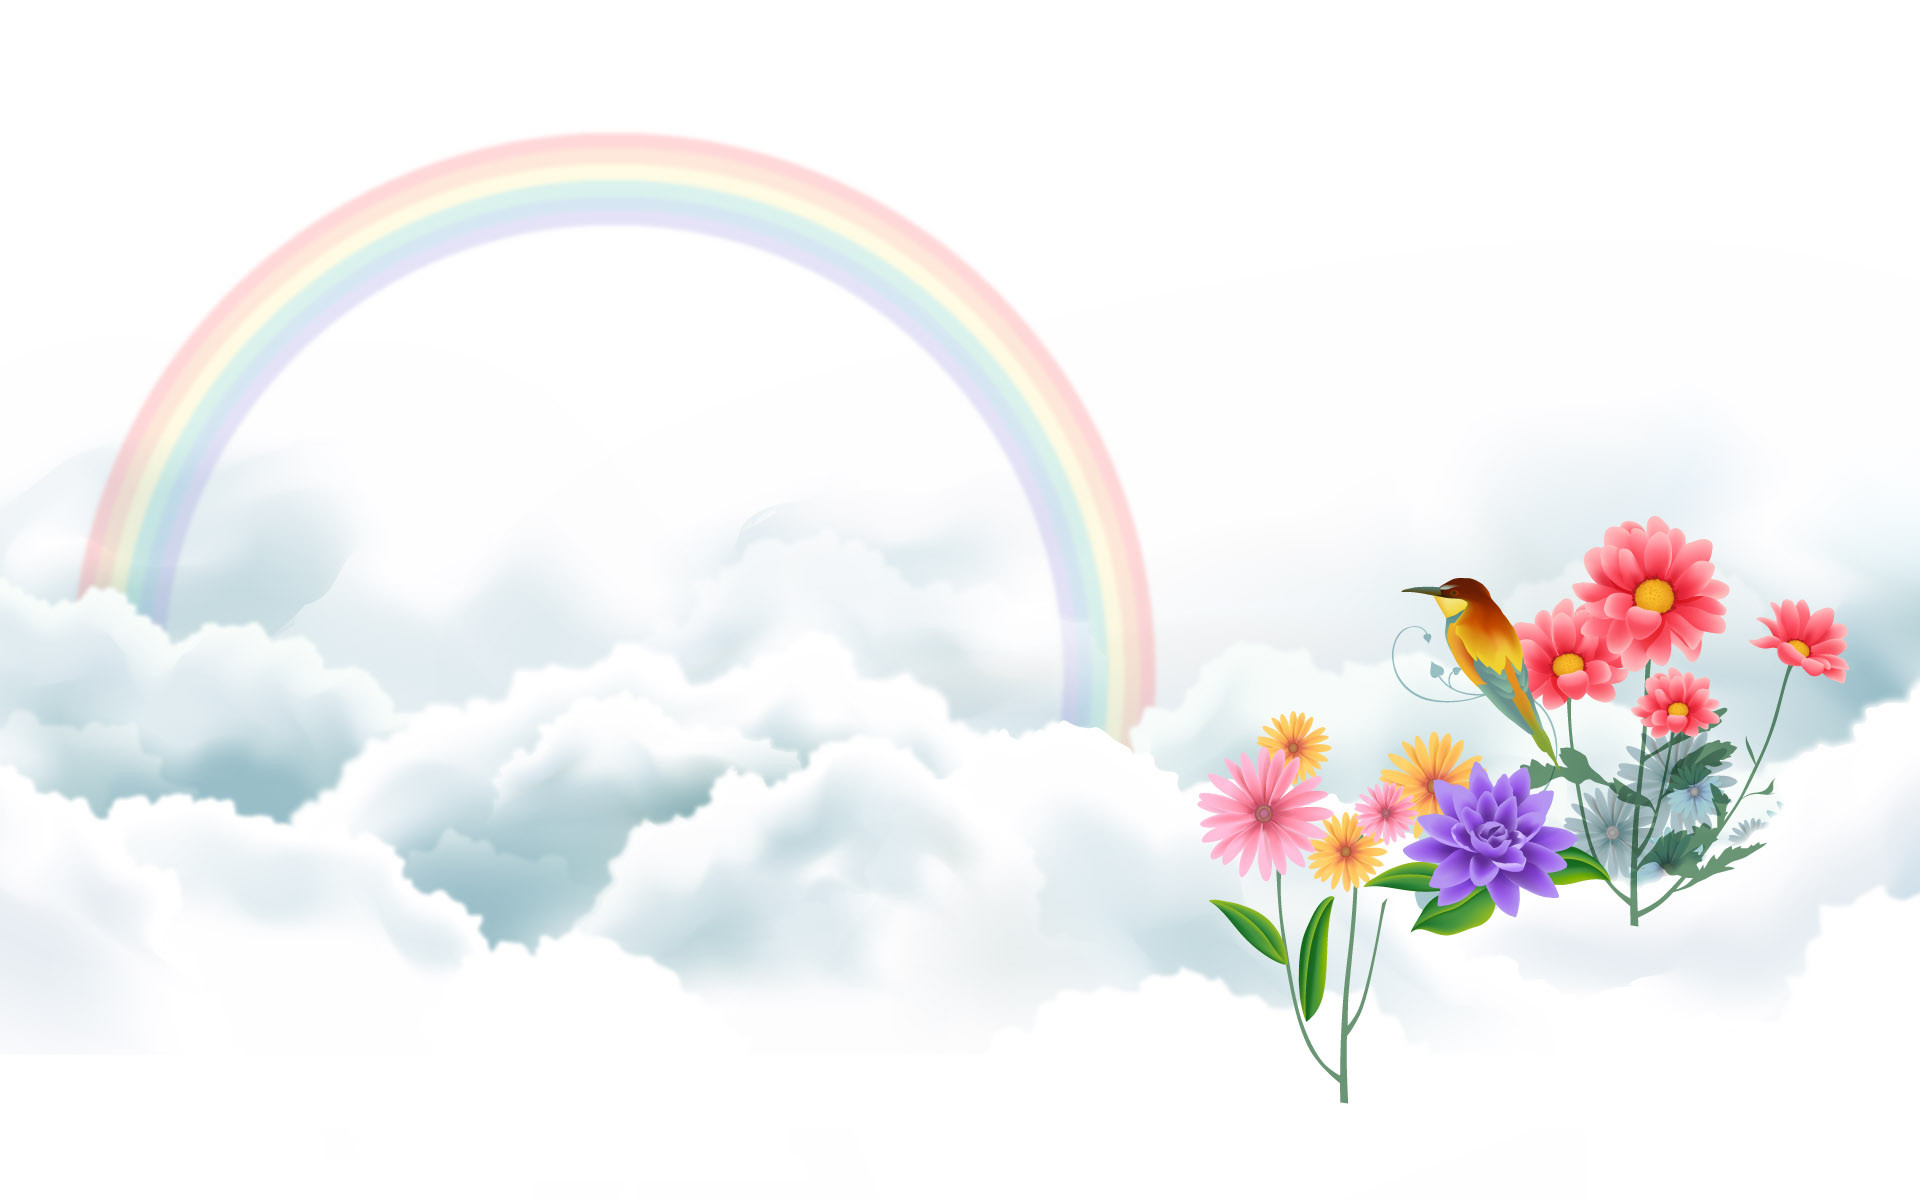 Res: 1920x1200, Rainbow Desktop Backgrounds Wallpaper High Definition High Quality